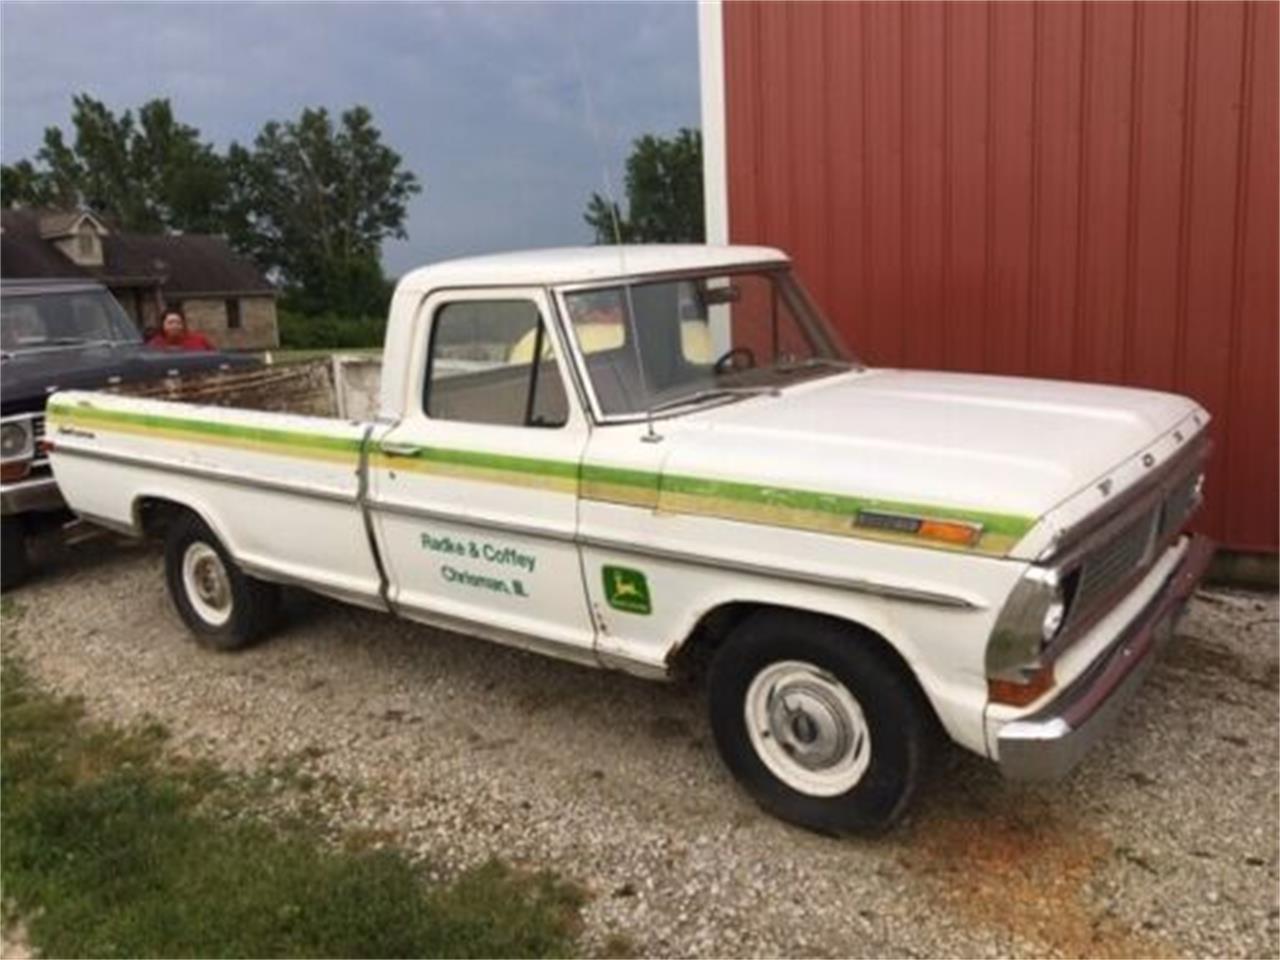 for sale 1970 ford f100 in cadillac, michigan cars - cadillac, mi at geebo